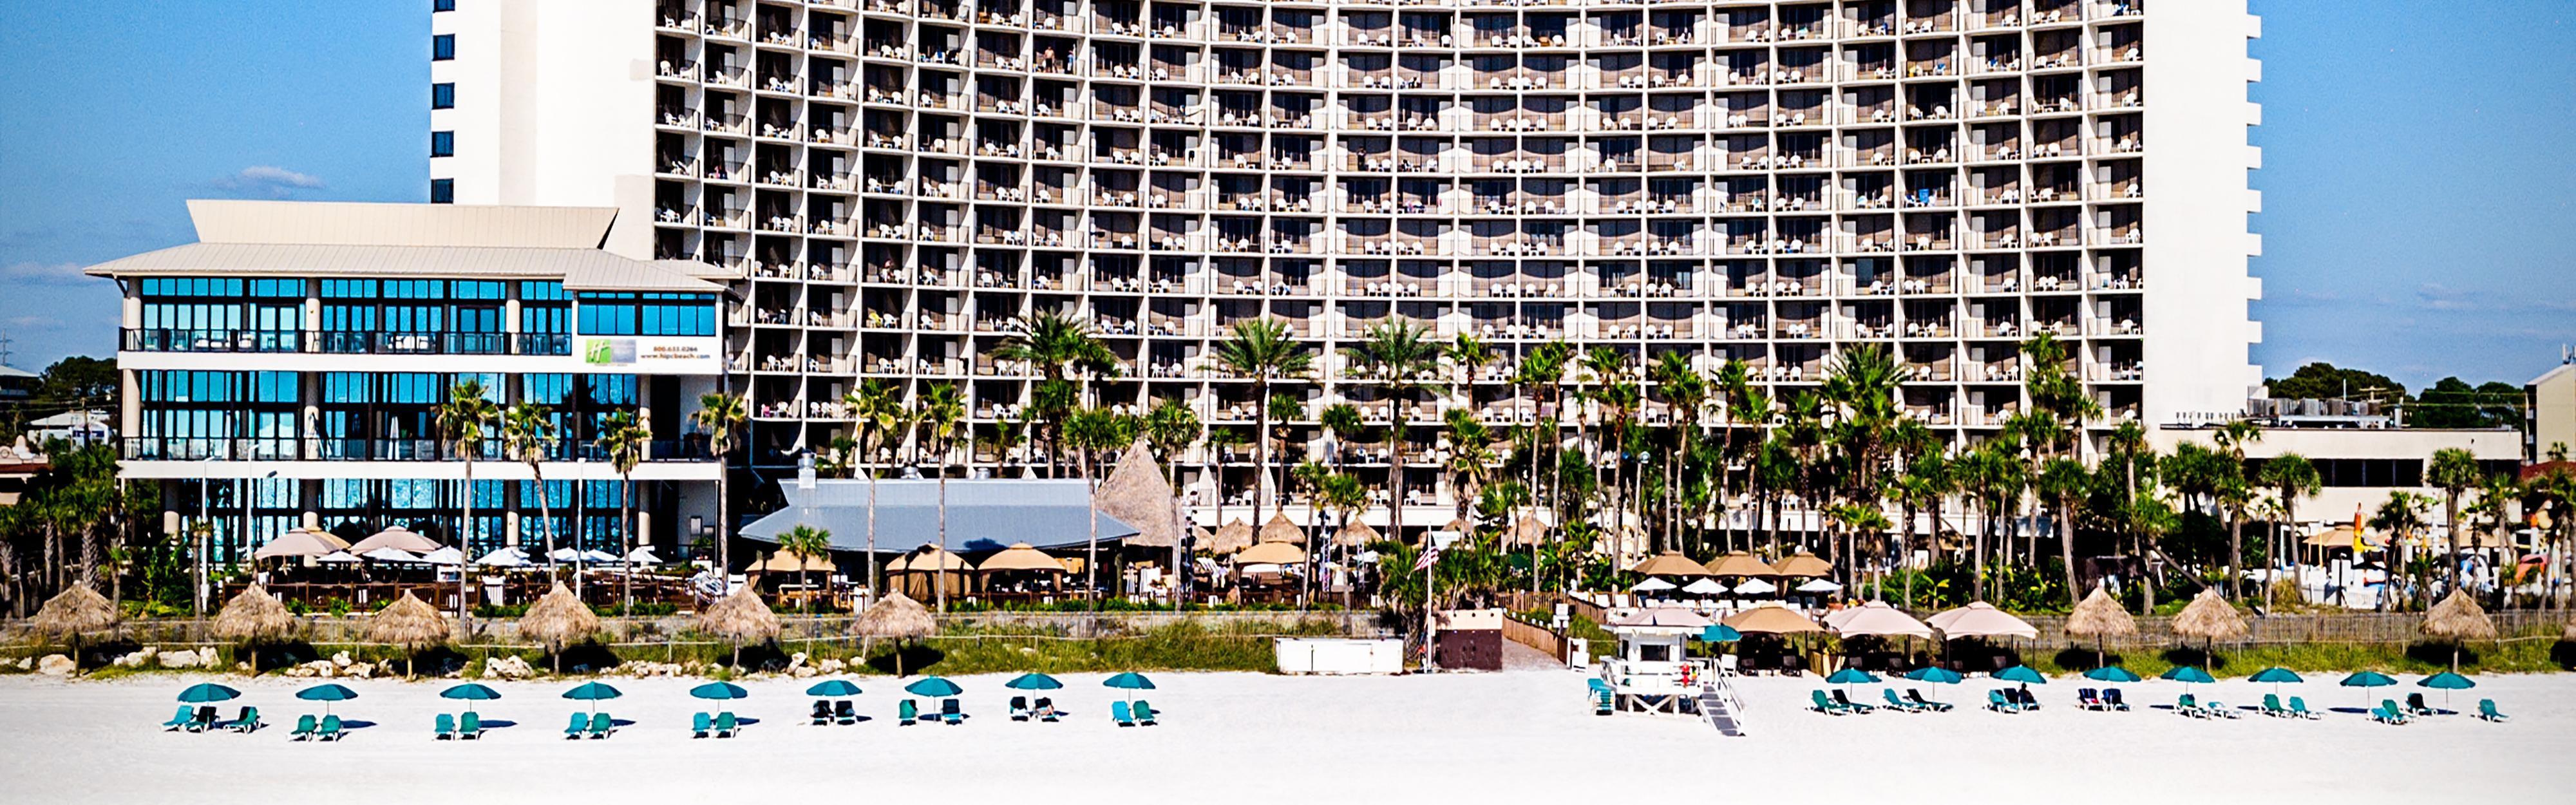 holiday inn resort panama city beach hotel by ihg rh ihg com holiday inn resort panama city cam holiday inn resort panama city beach fl